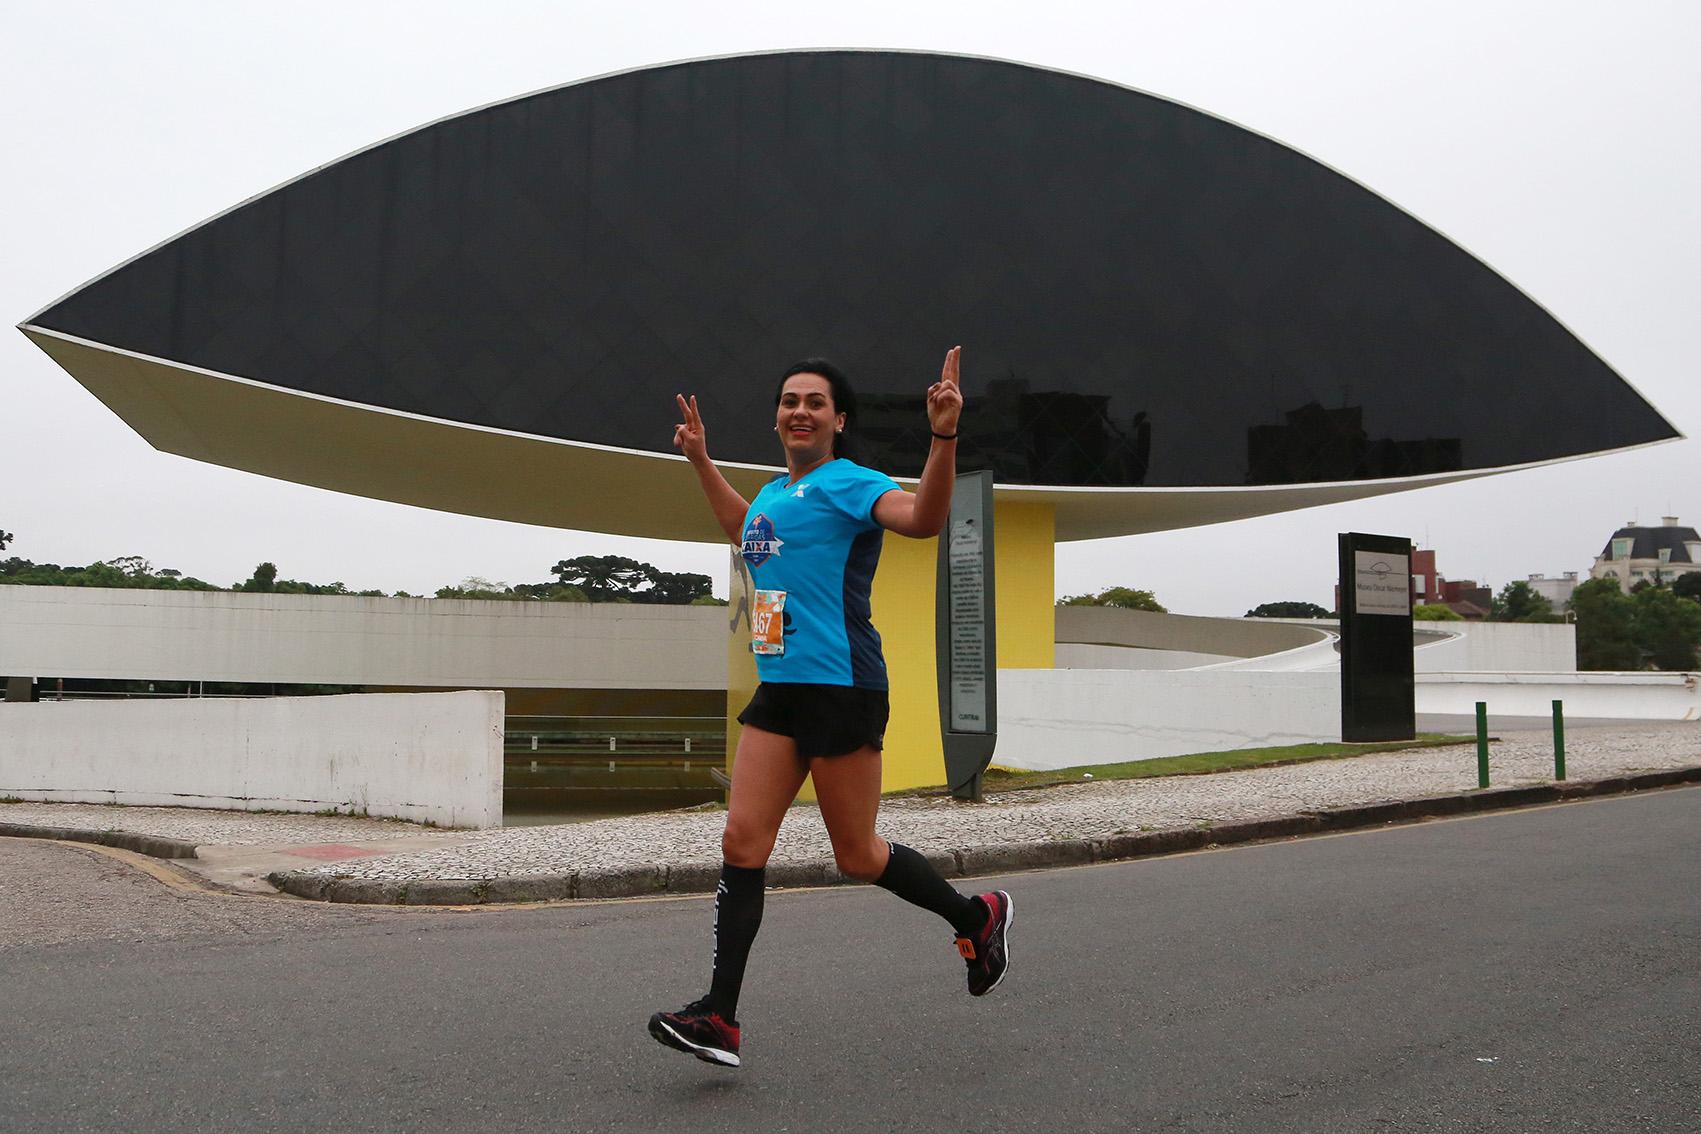 Museu Niemeyer integra o percurso. Foto: Luiz Doro /adorofoto/HT Sports